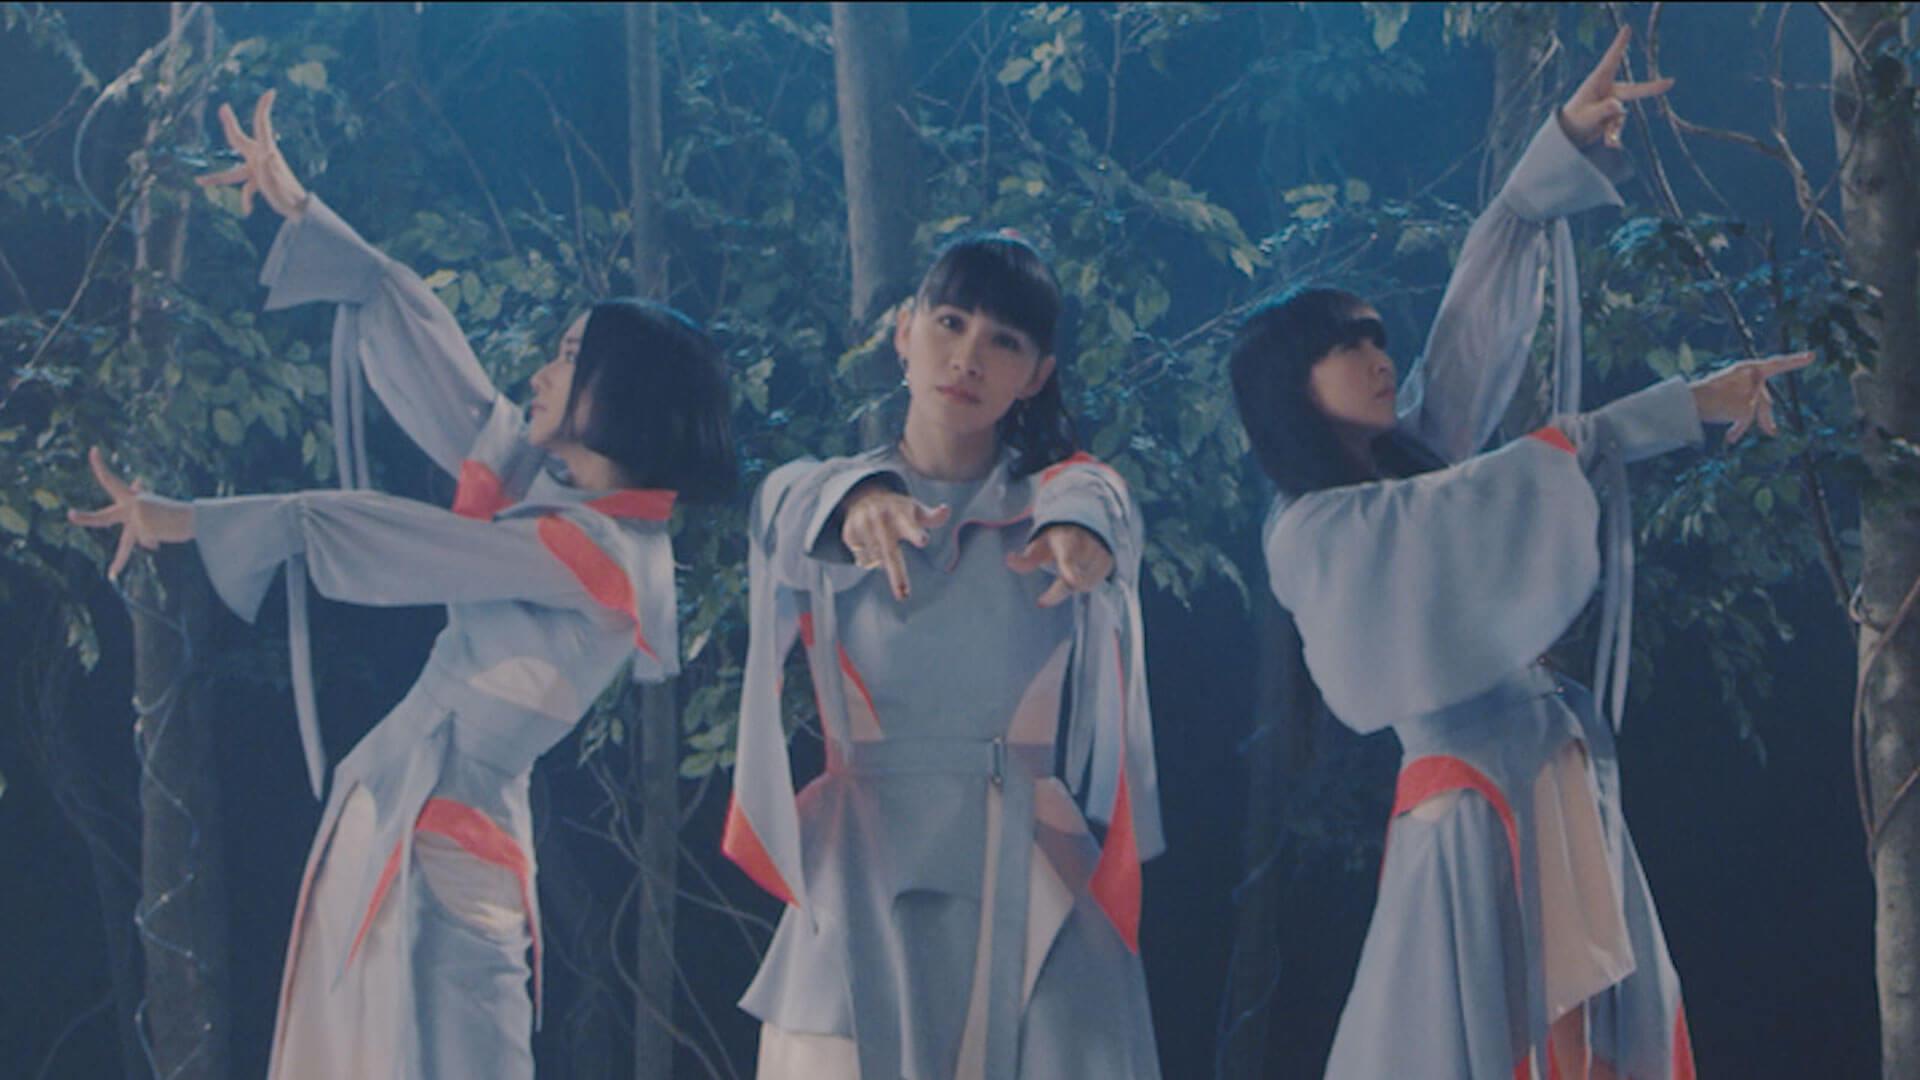 Perfume、映画『屍人荘の殺人』主題歌「再生」のMVを公開!15年間のMVすべての映像を使用したリップシンクに注目 music191213_perfume_mv_3